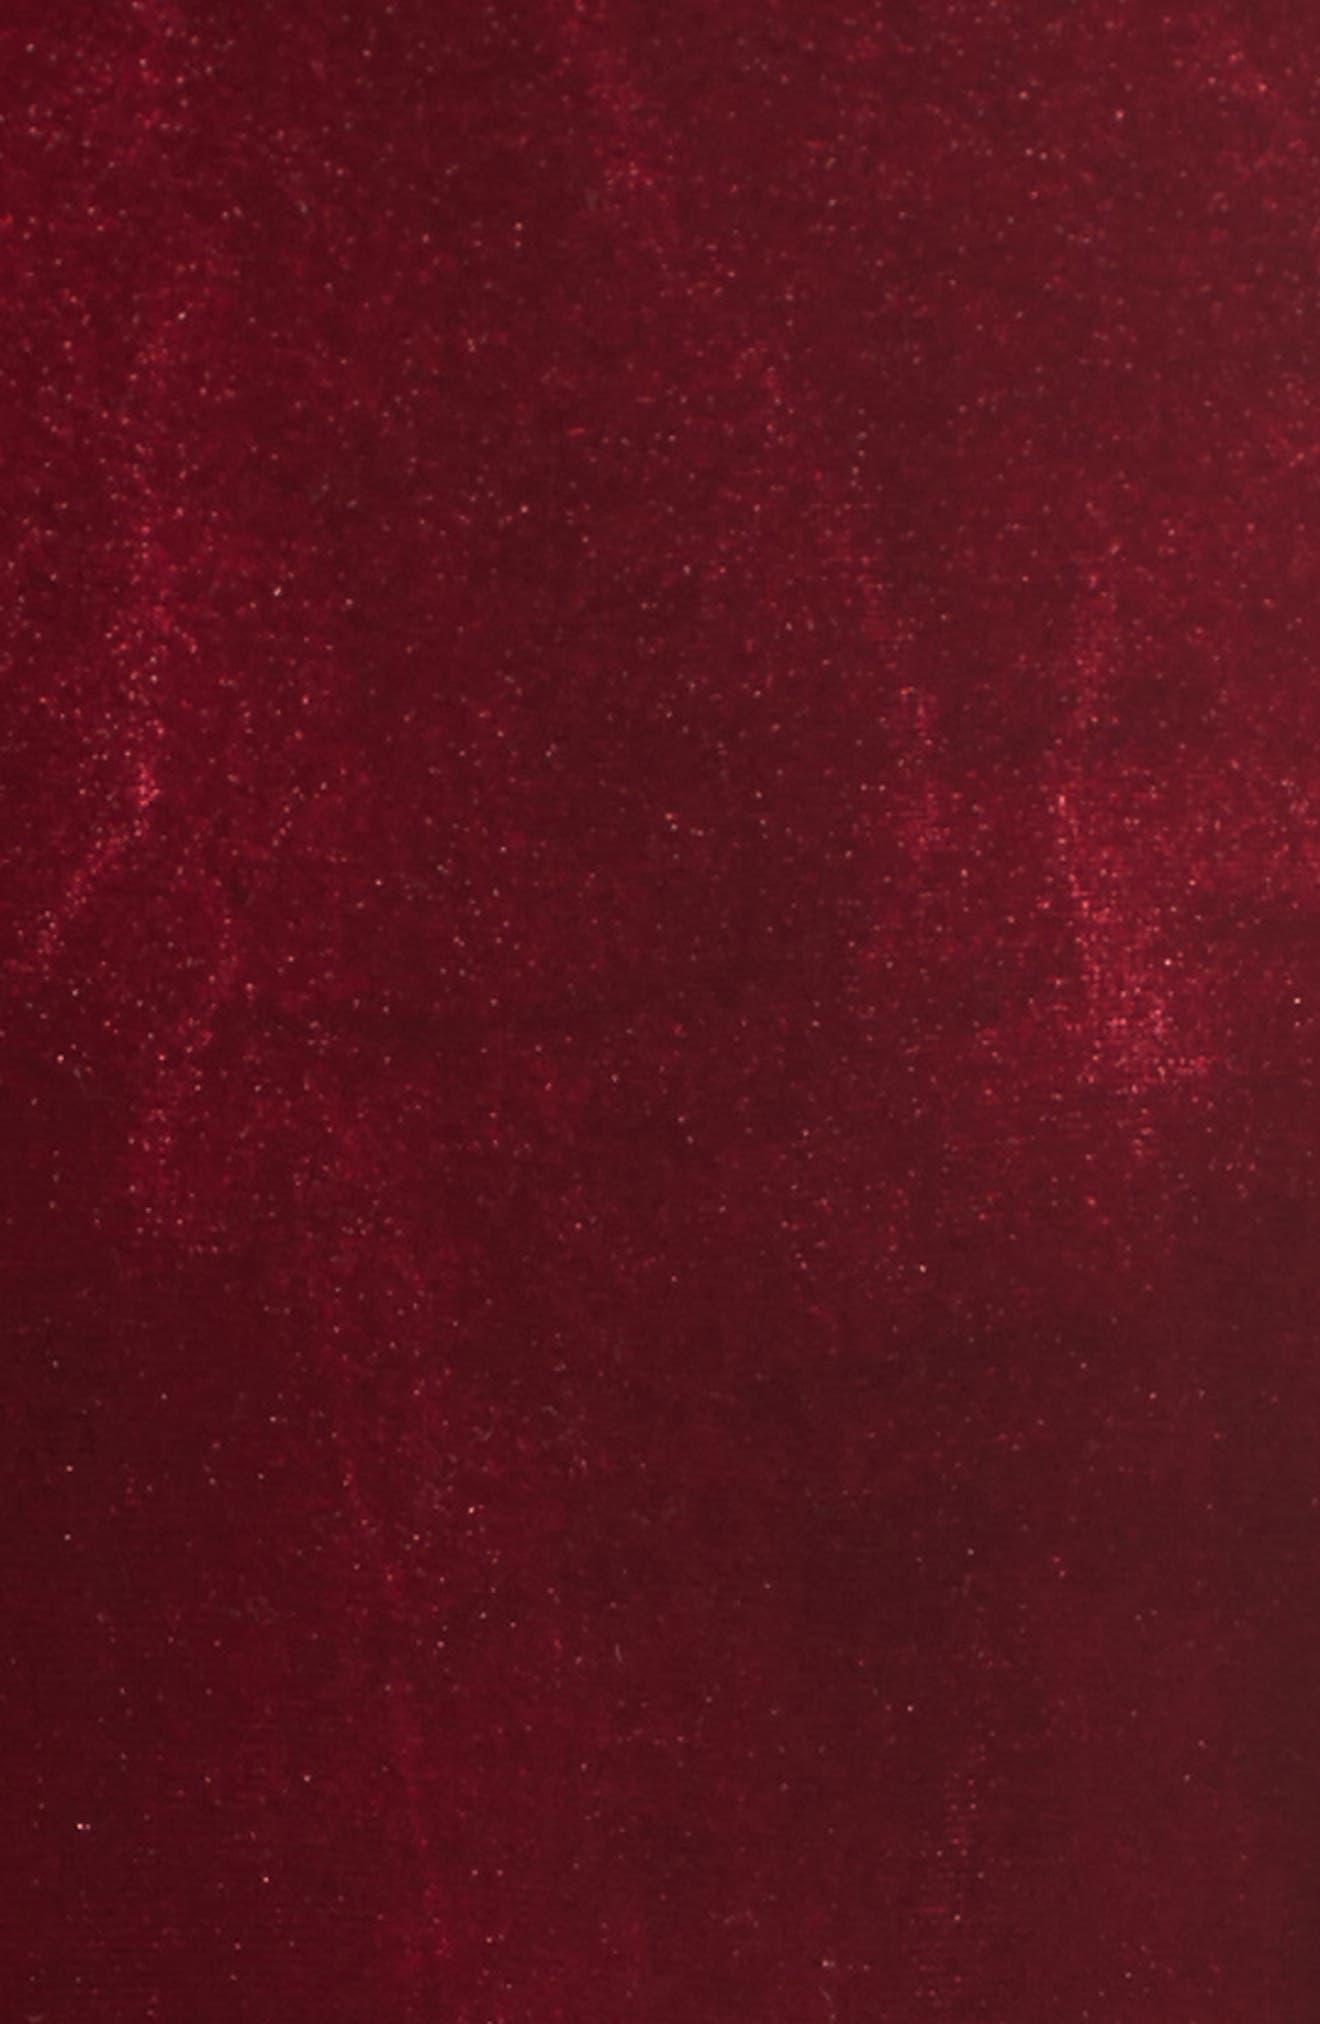 Reach Out Velvet Maxi Dress,                             Alternate thumbnail 5, color,                             Burgundy